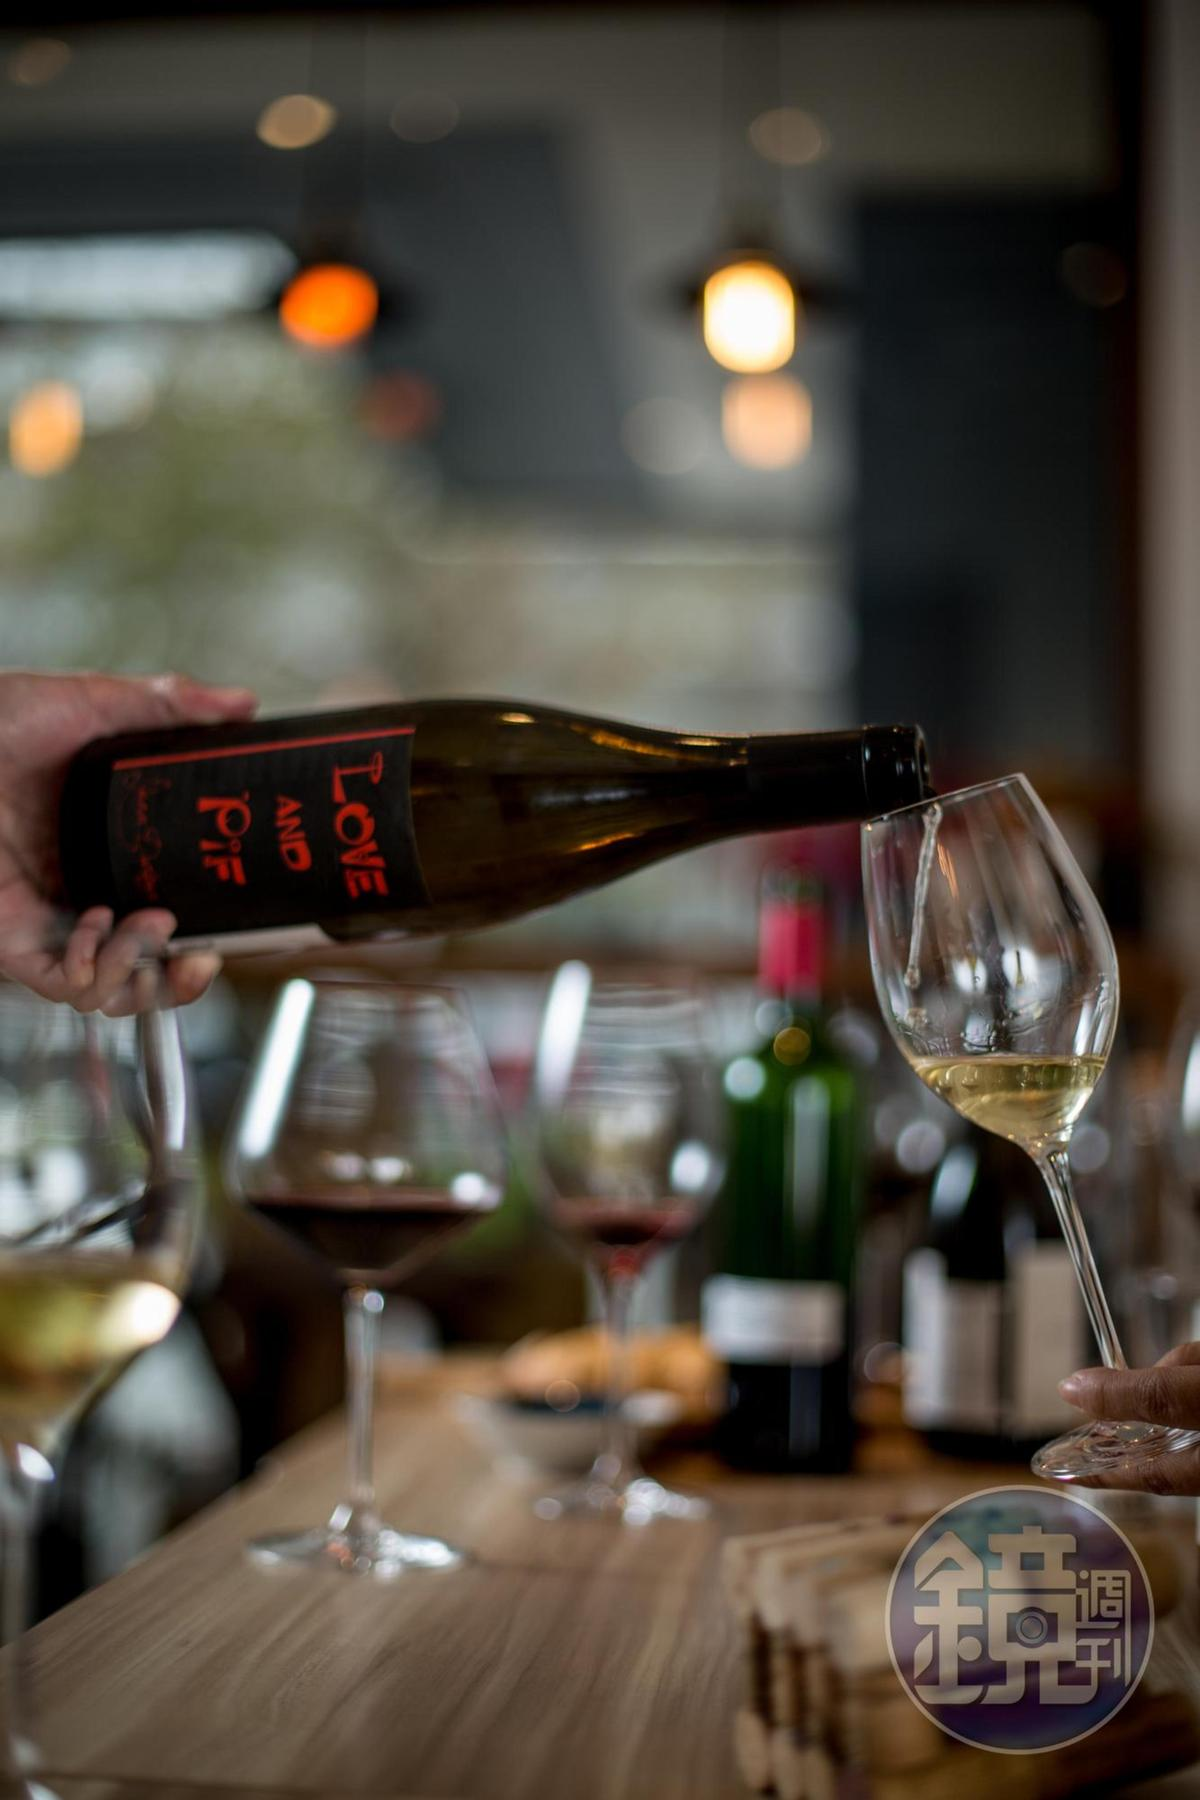 「Recrue des Sens, Love & Pif, Burgundy France, 2015 」是不加二氧化硫的自然酒,帶微氣泡,入口輕盈。(1,950元/瓶)